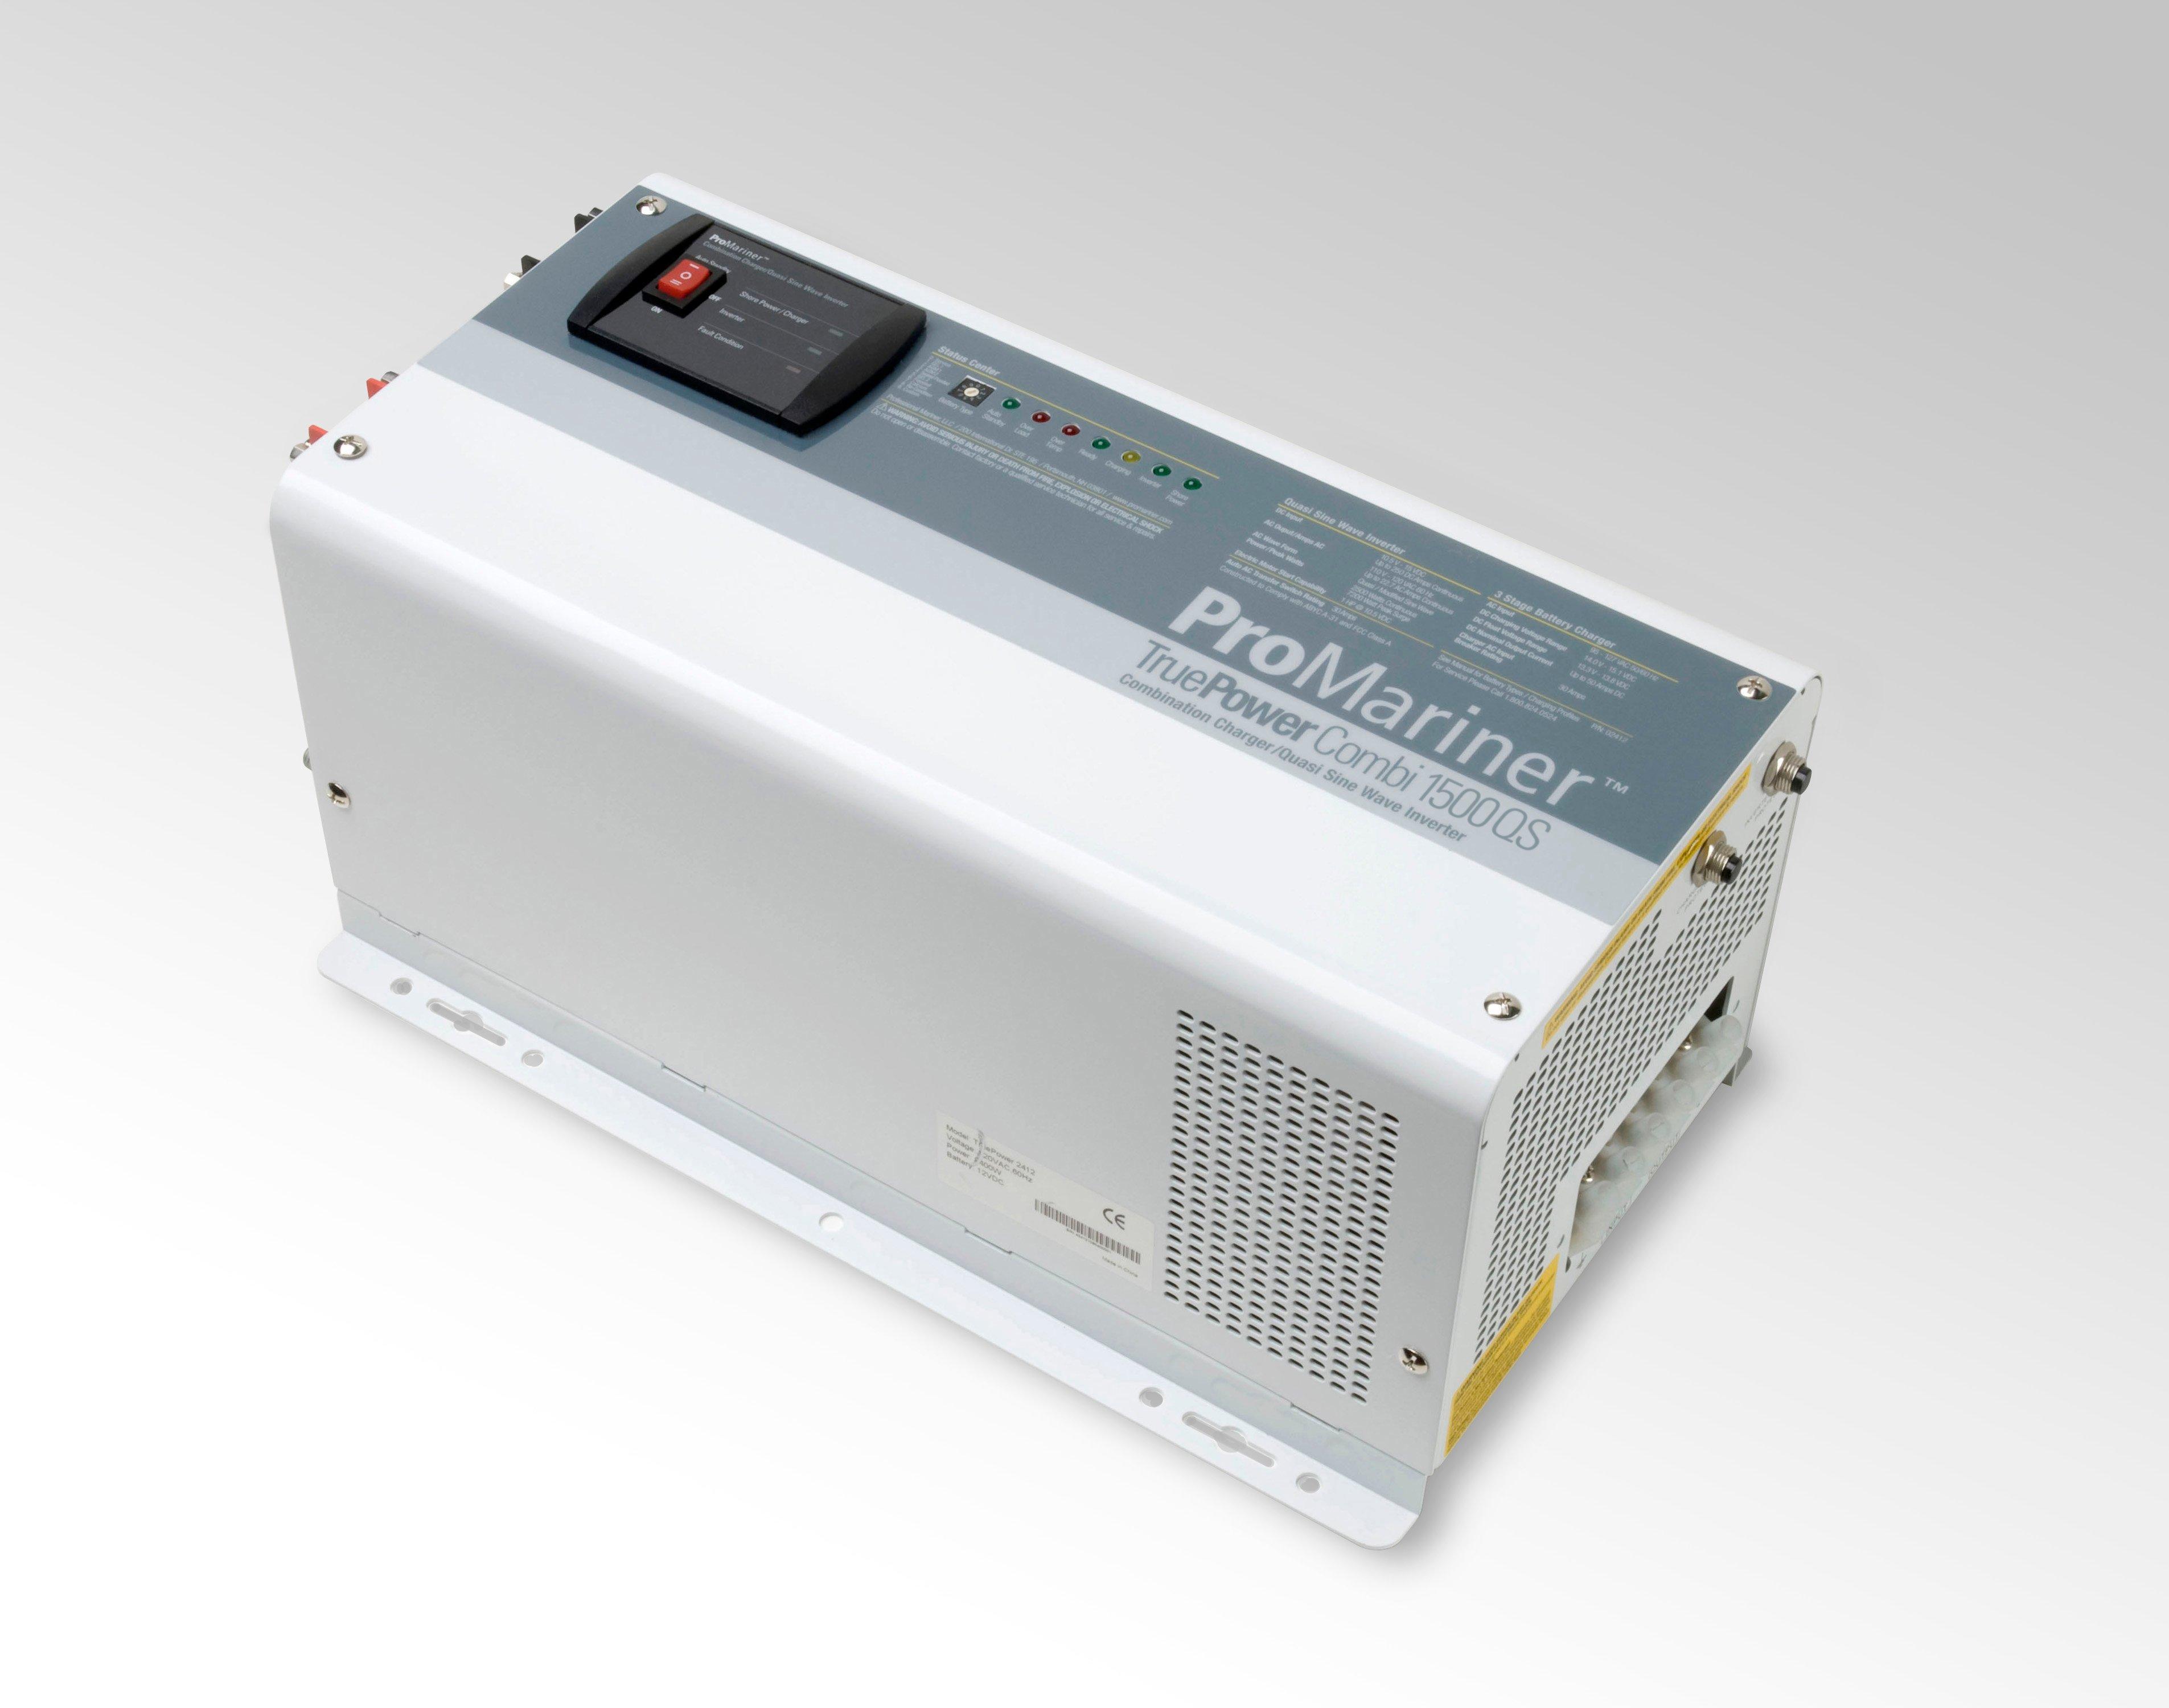 334880 23421?mw=410&mh=270 truepower combi 1500w qs 110v ac 12v dc promariner promariner battery isolator wiring diagram at soozxer.org